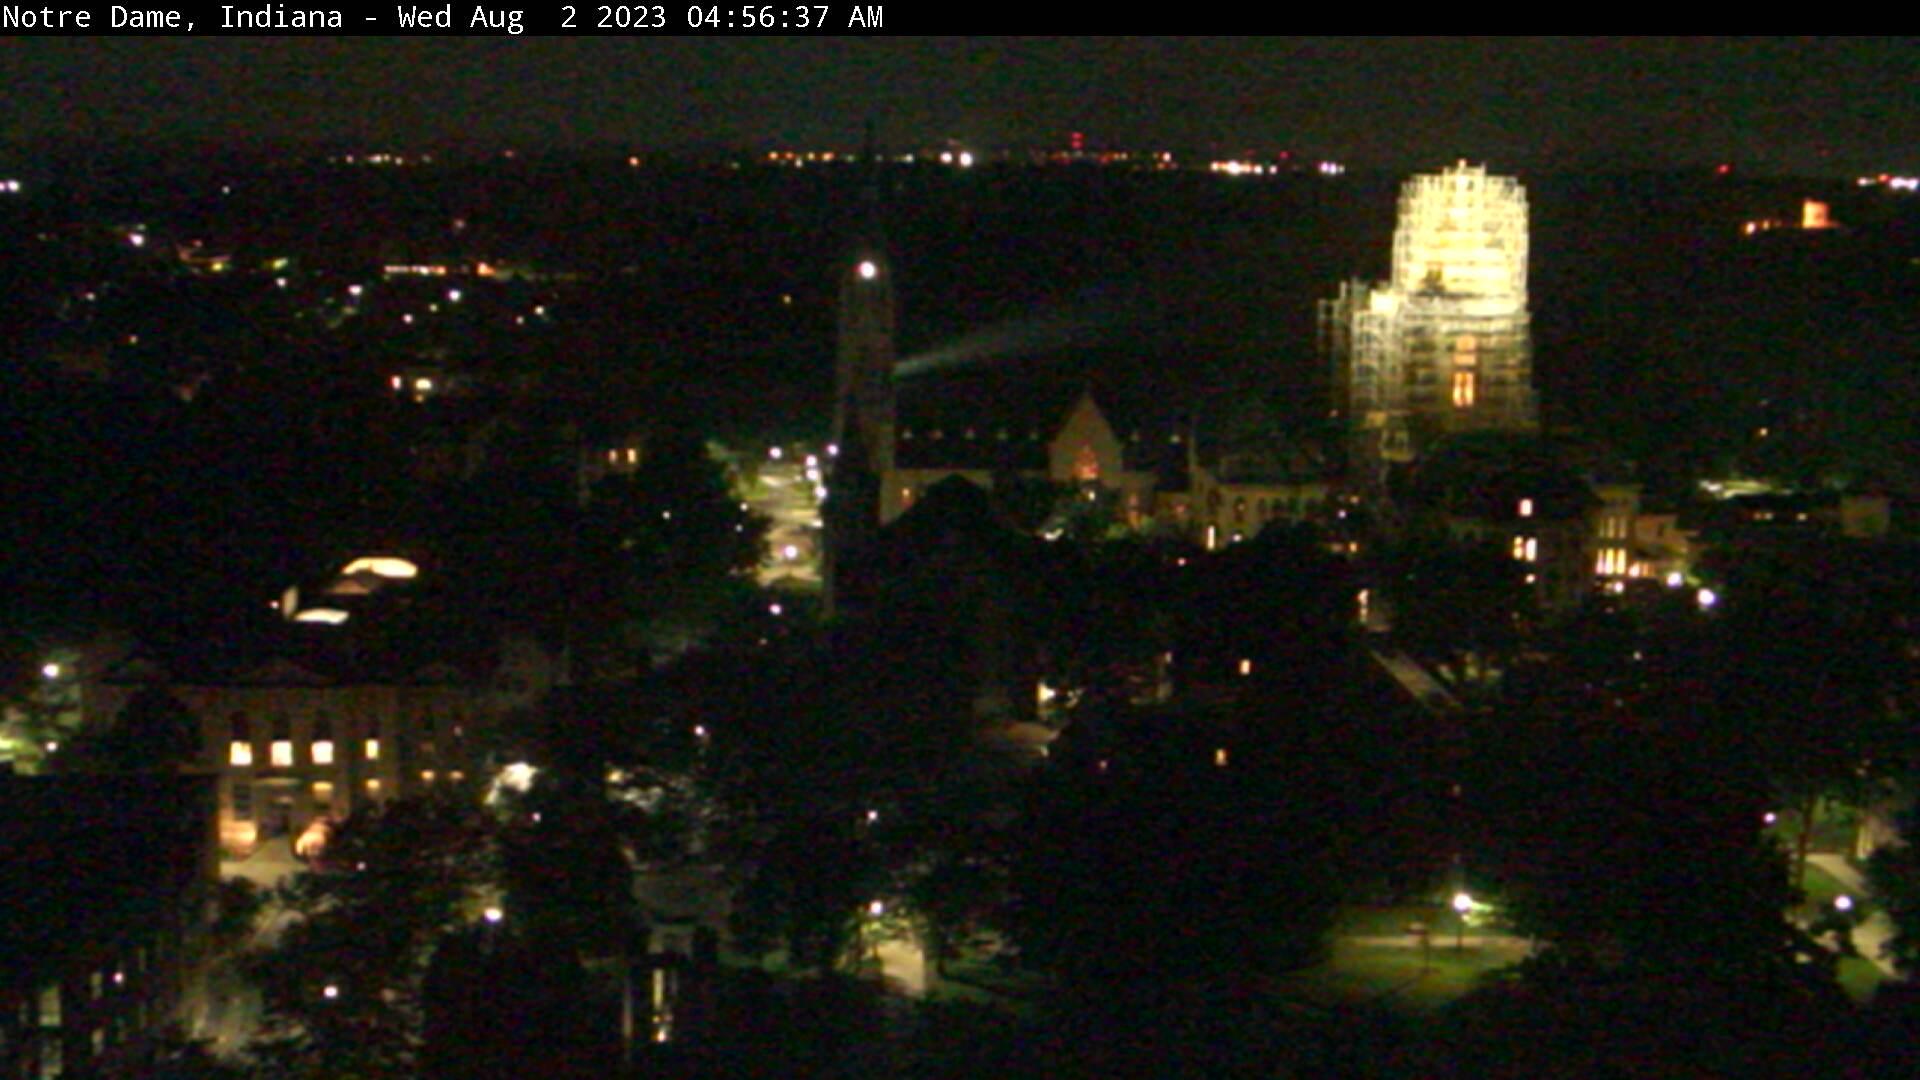 Notre Dame, Indiana Sat. 04:56